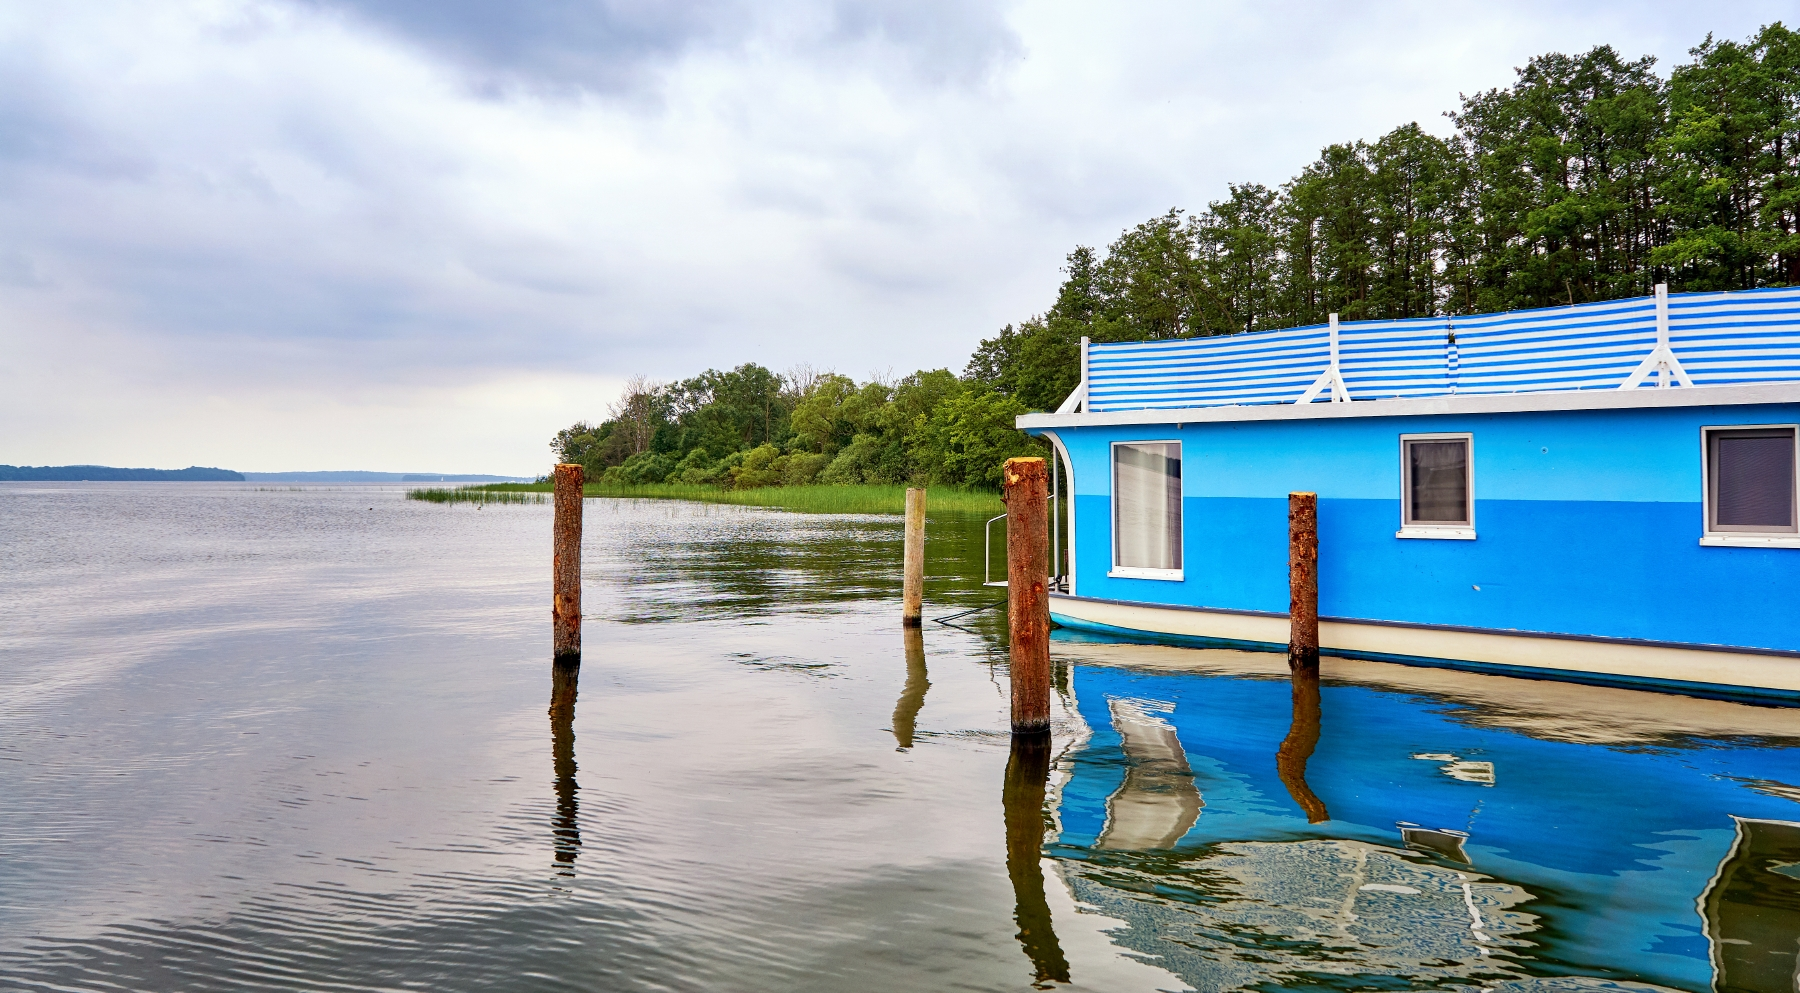 blaues Hausboot in Schweriner See Mecklenburg-Vorpommern